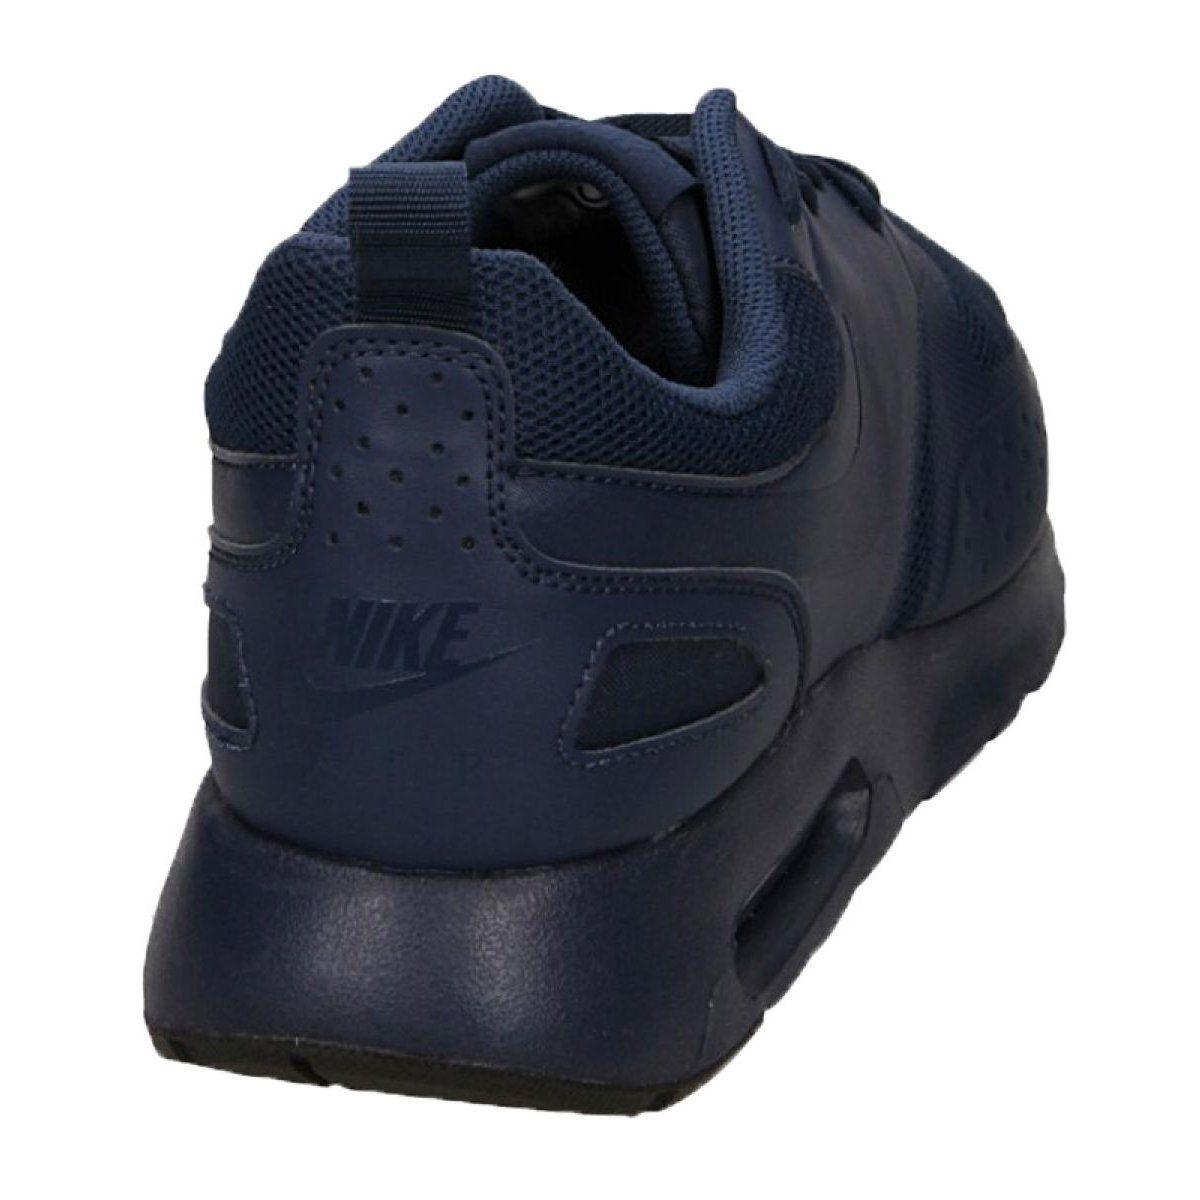 Buty Nike Air Max Vision M 918230 401 Granatowe Nike Air Max Mens Nike Shoes Nike Air